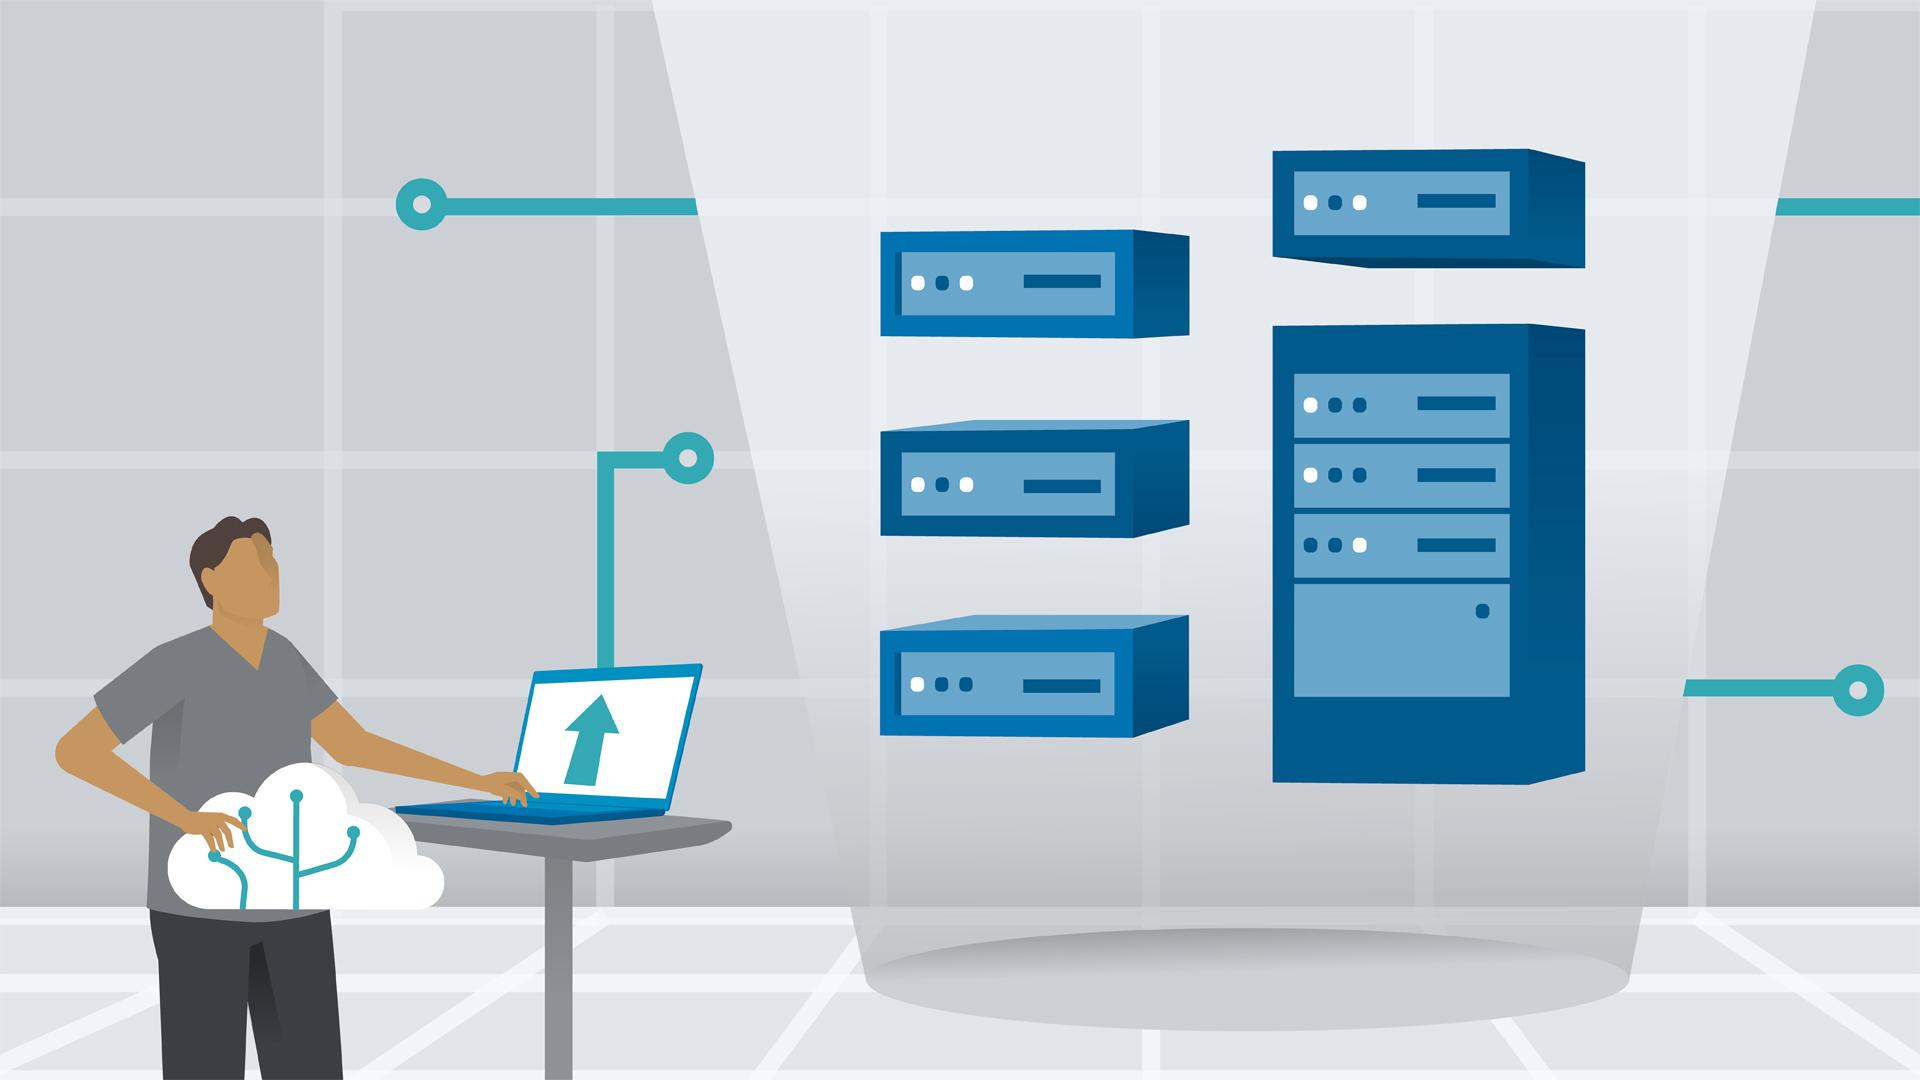 Deploy Microsoft Exchange Server 2019: Deploying Exchange Server 2019